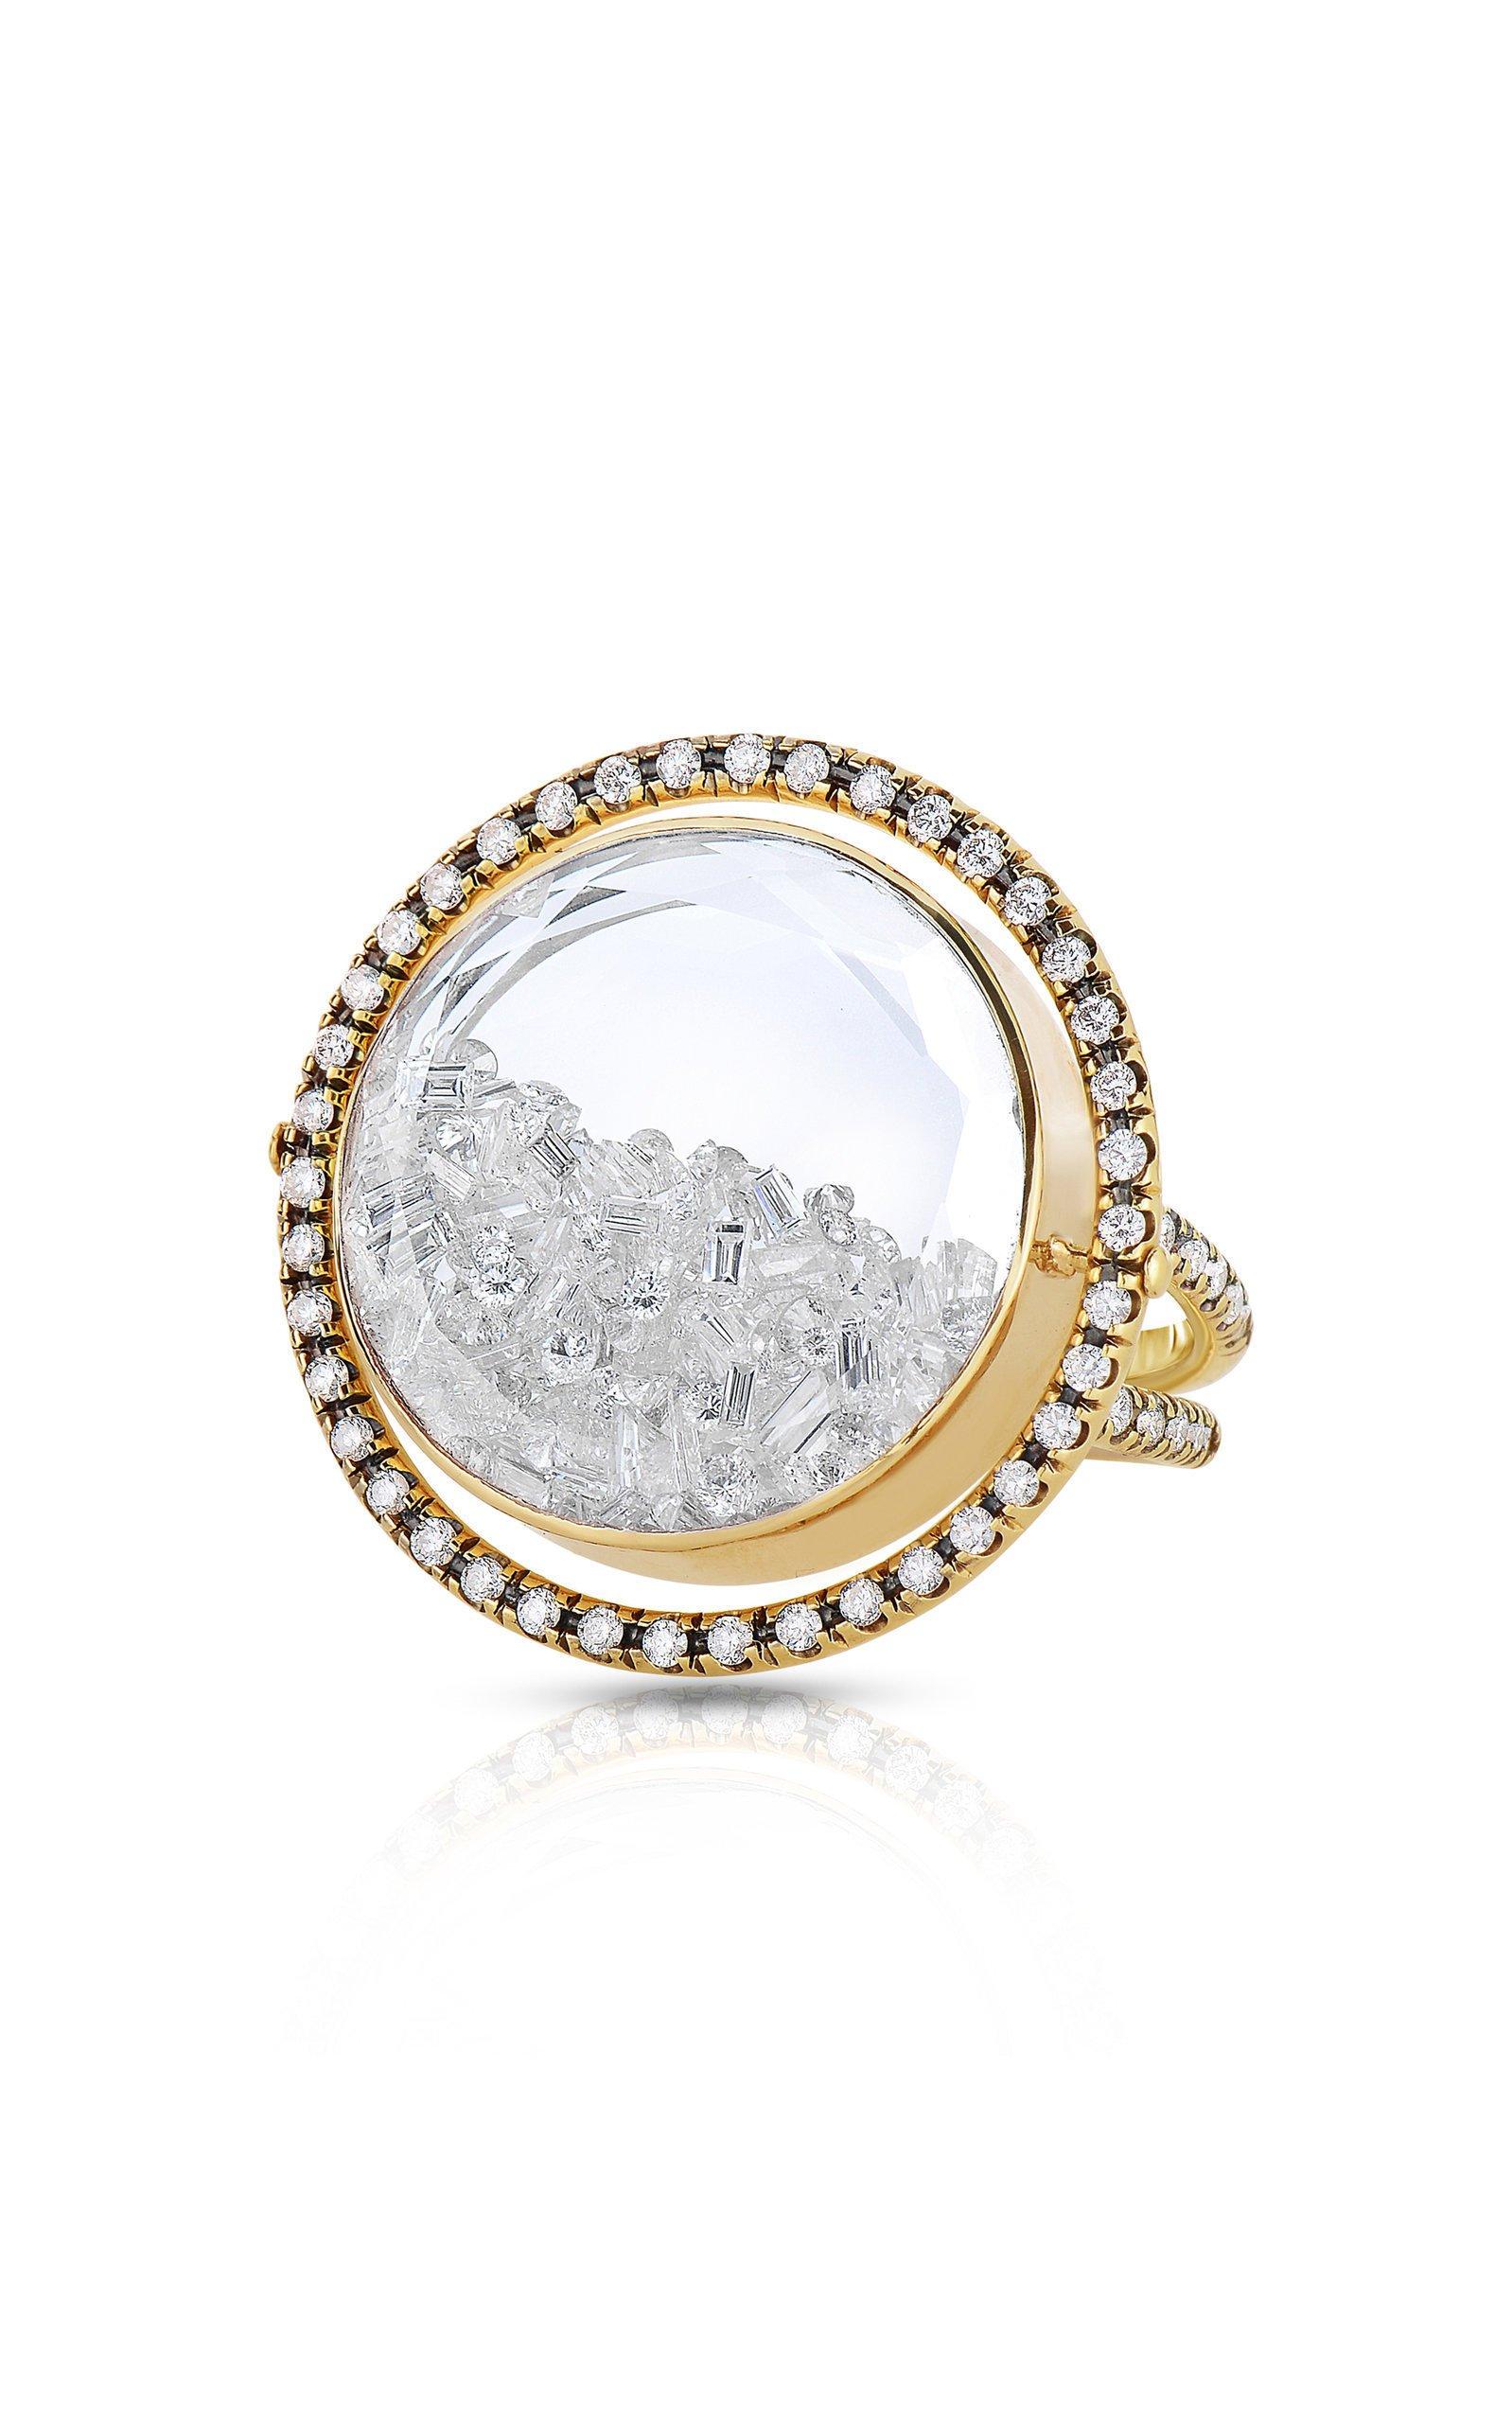 Moritz Glik Movable Diamond Kaleidoscope Shaker Ring